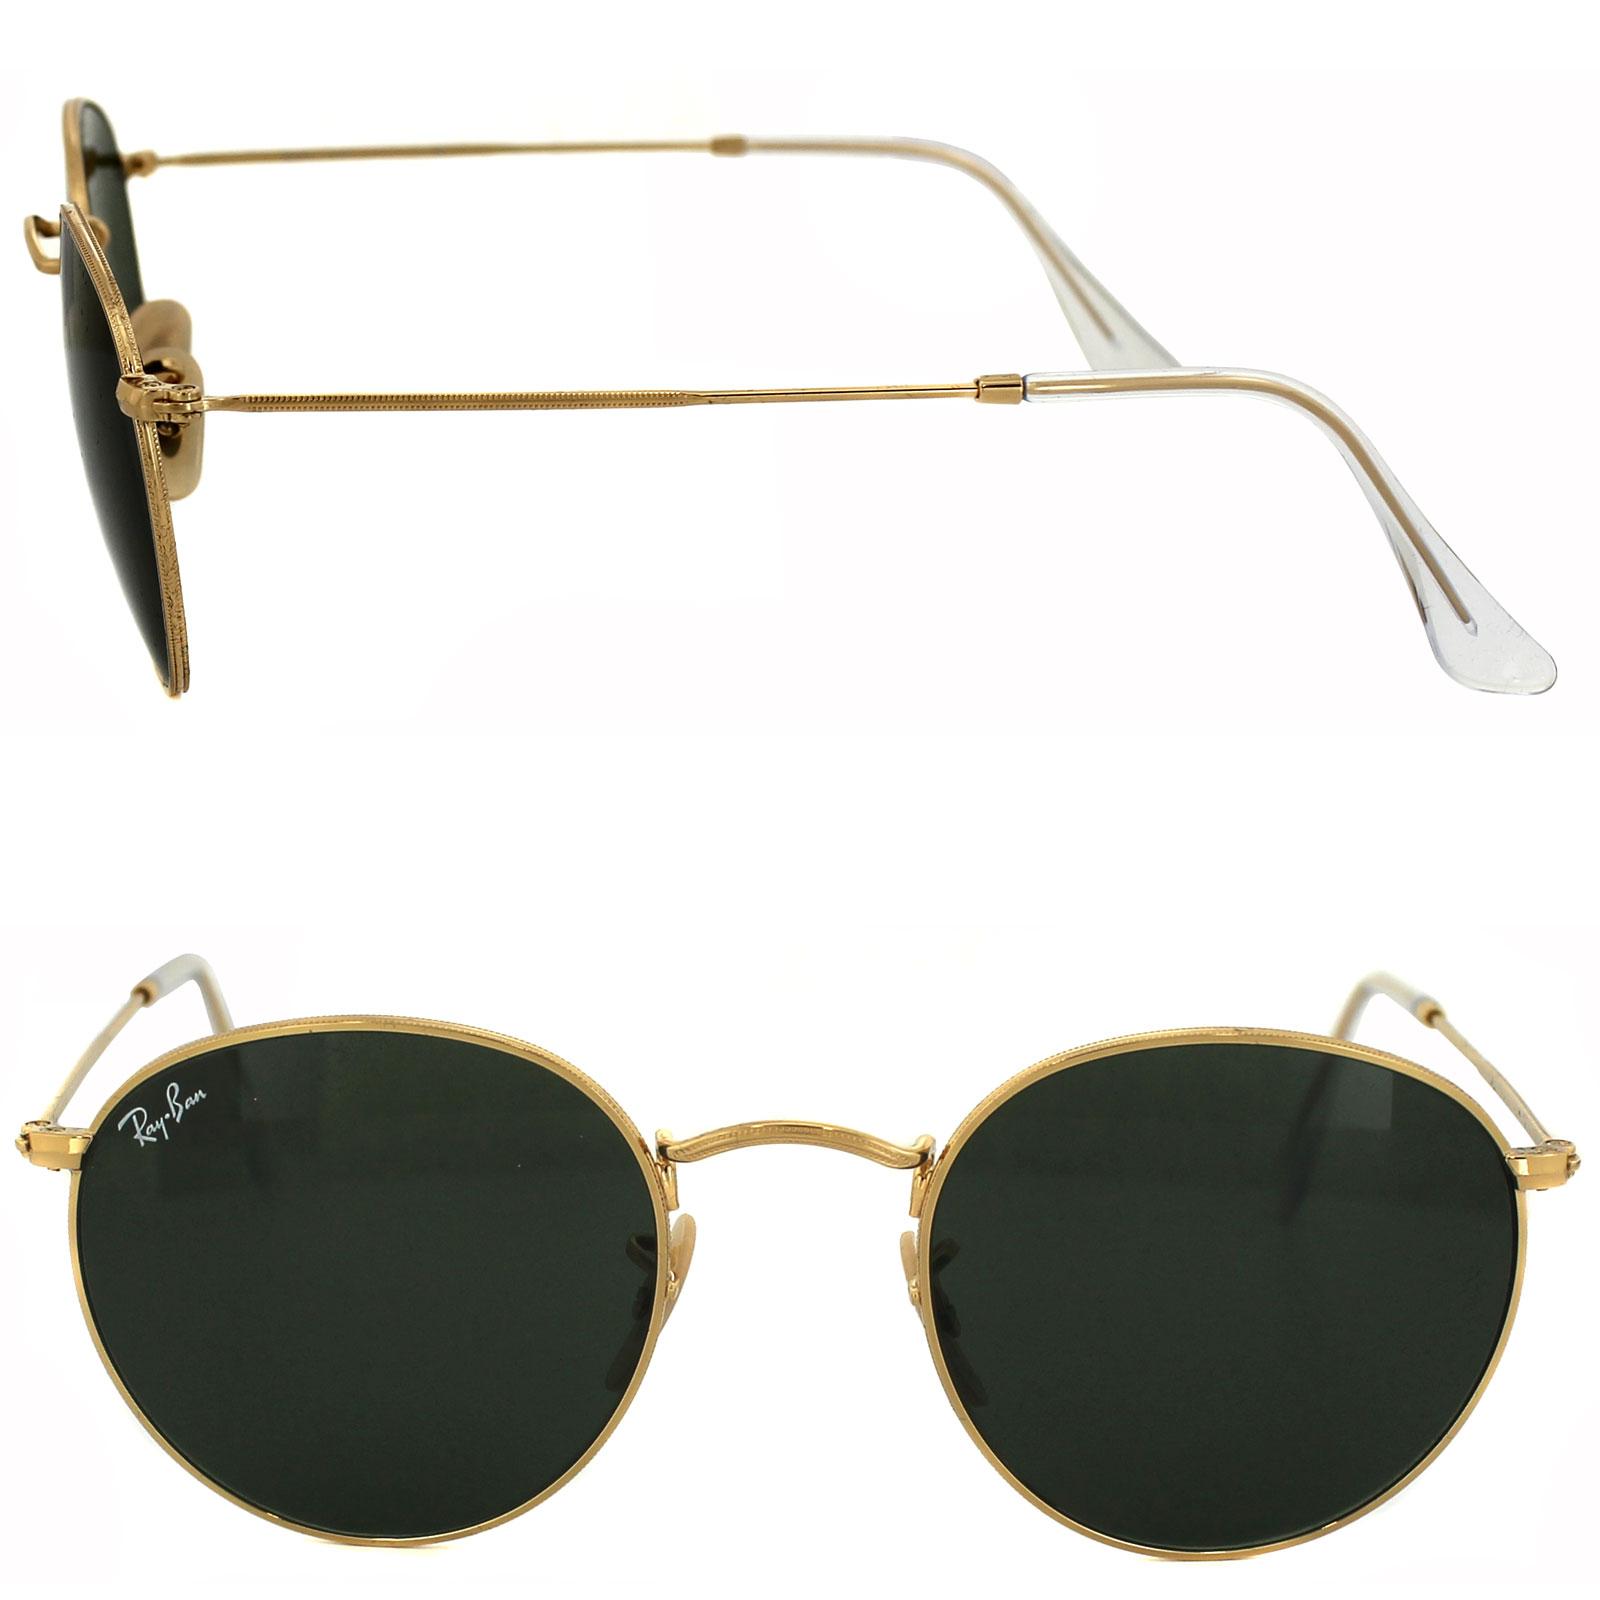 Sentinel Ray-Ban Sunglasses Round Metal 3447 001 Gold Green Medium 50mm a797fd5e08fc